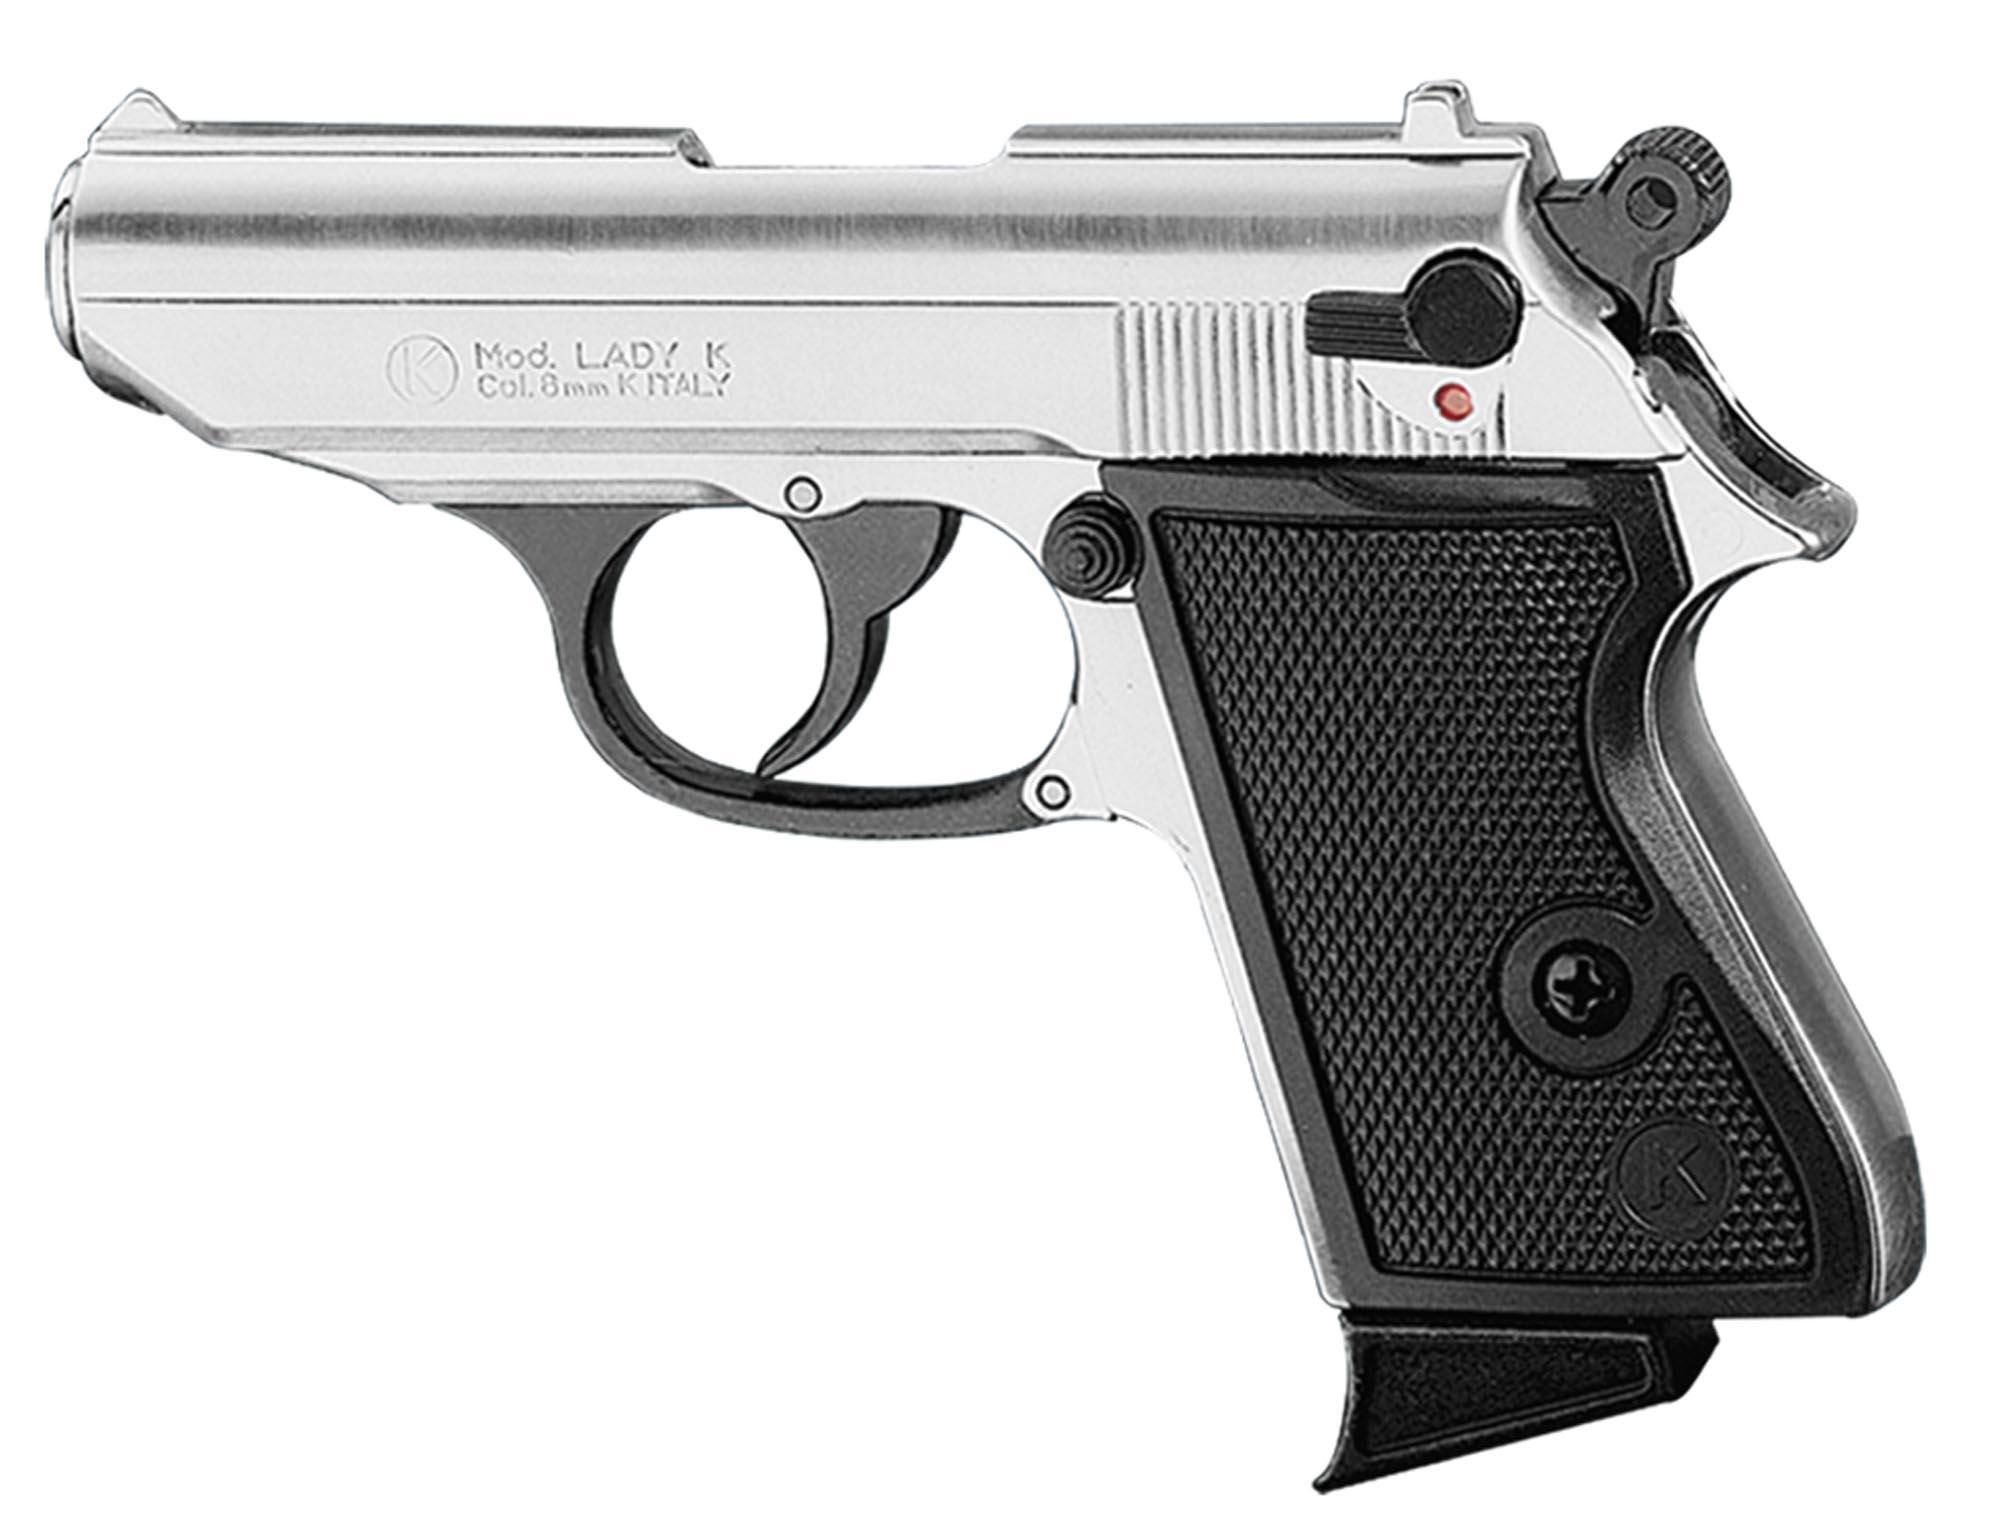 eaab210 chiappa pistolet 9 mm blanc lady nickel chiappa. Black Bedroom Furniture Sets. Home Design Ideas